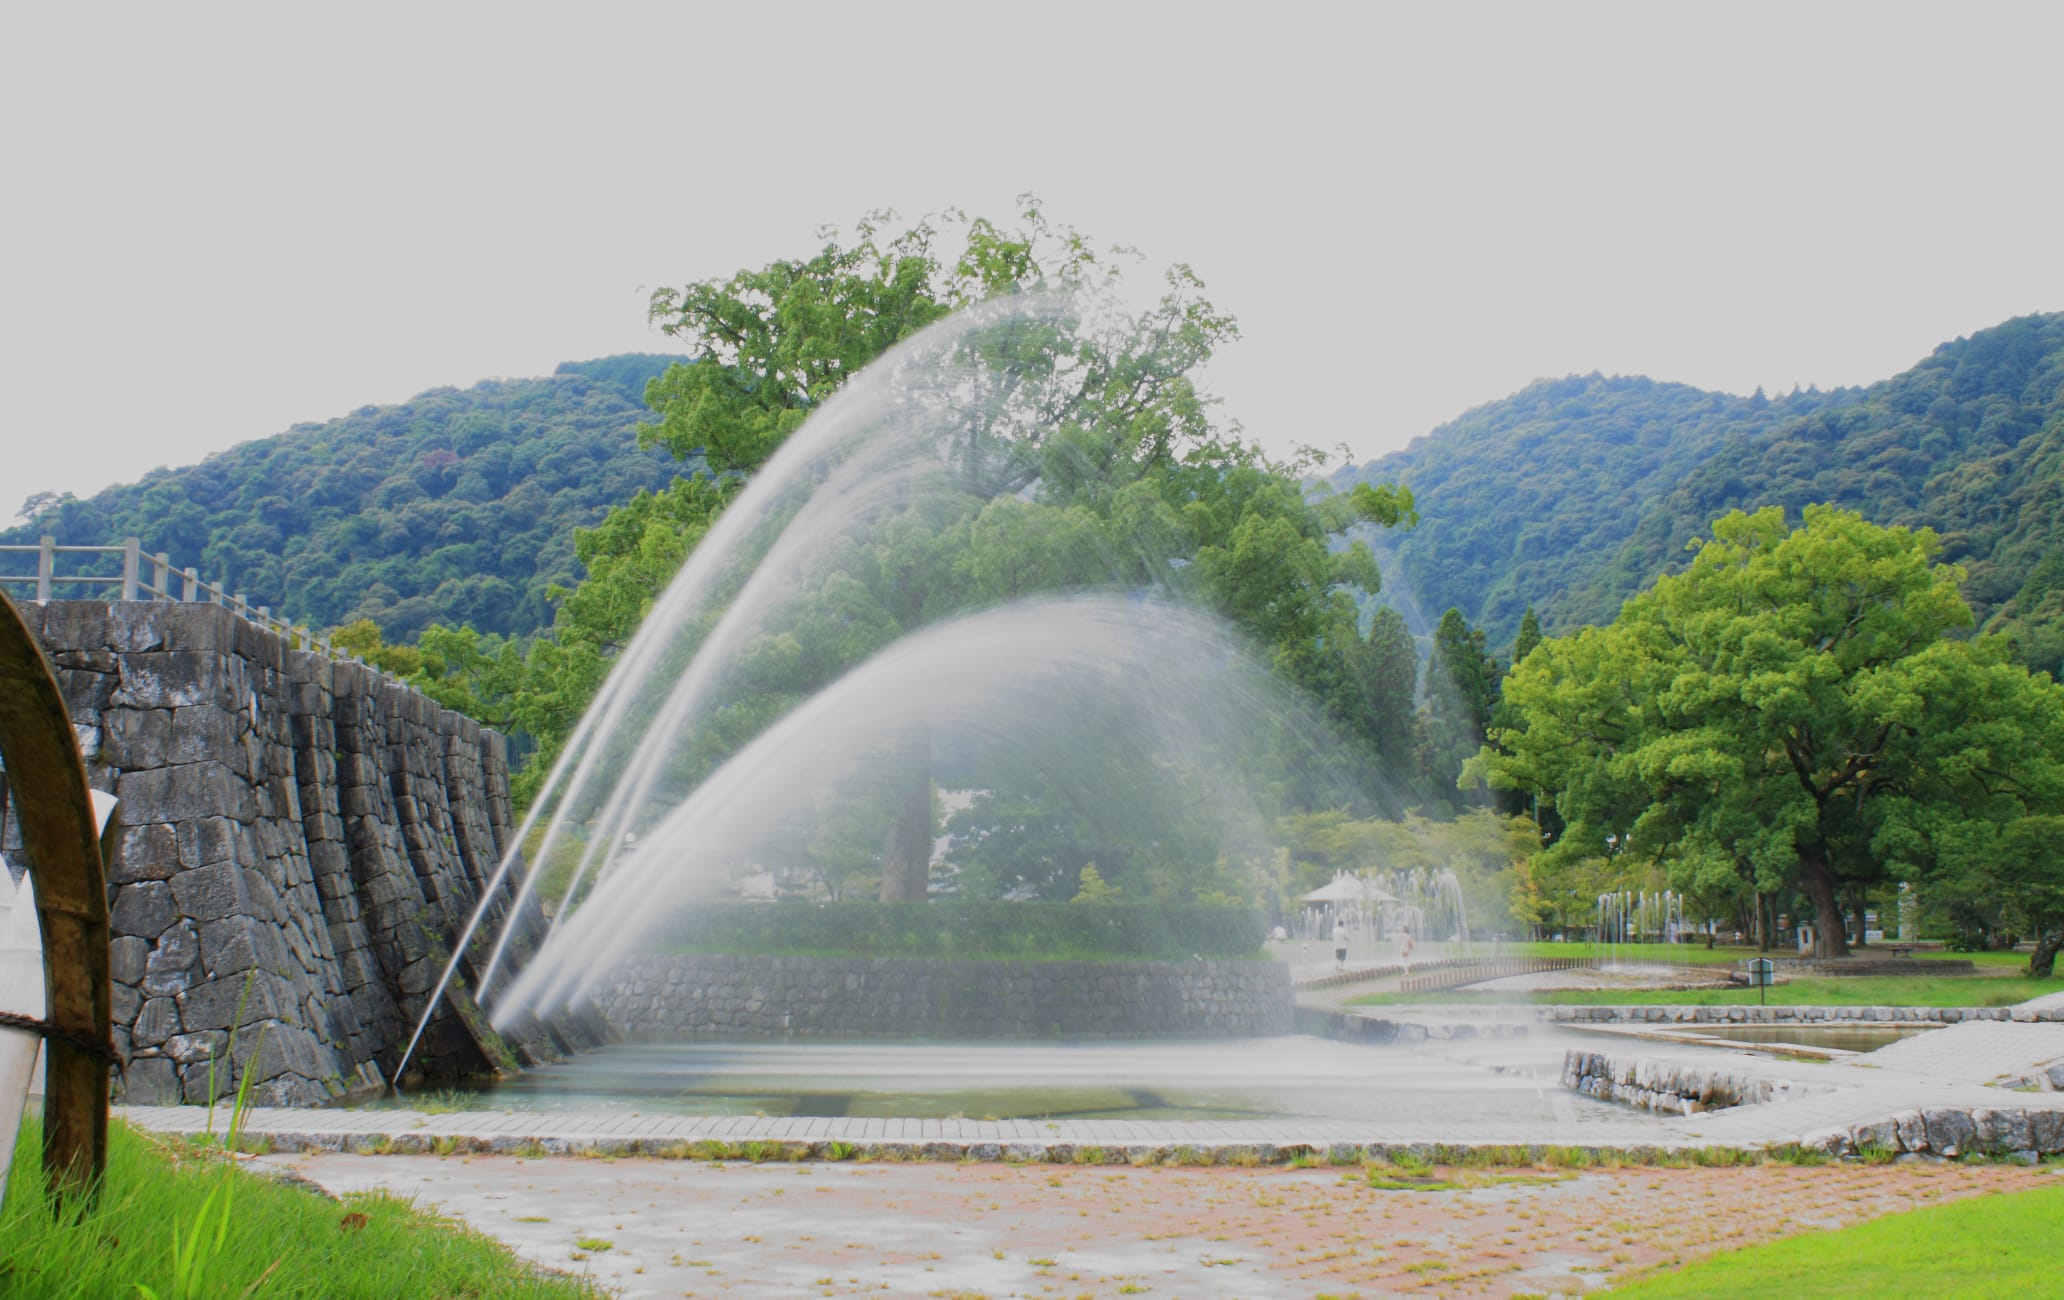 Kikko Park